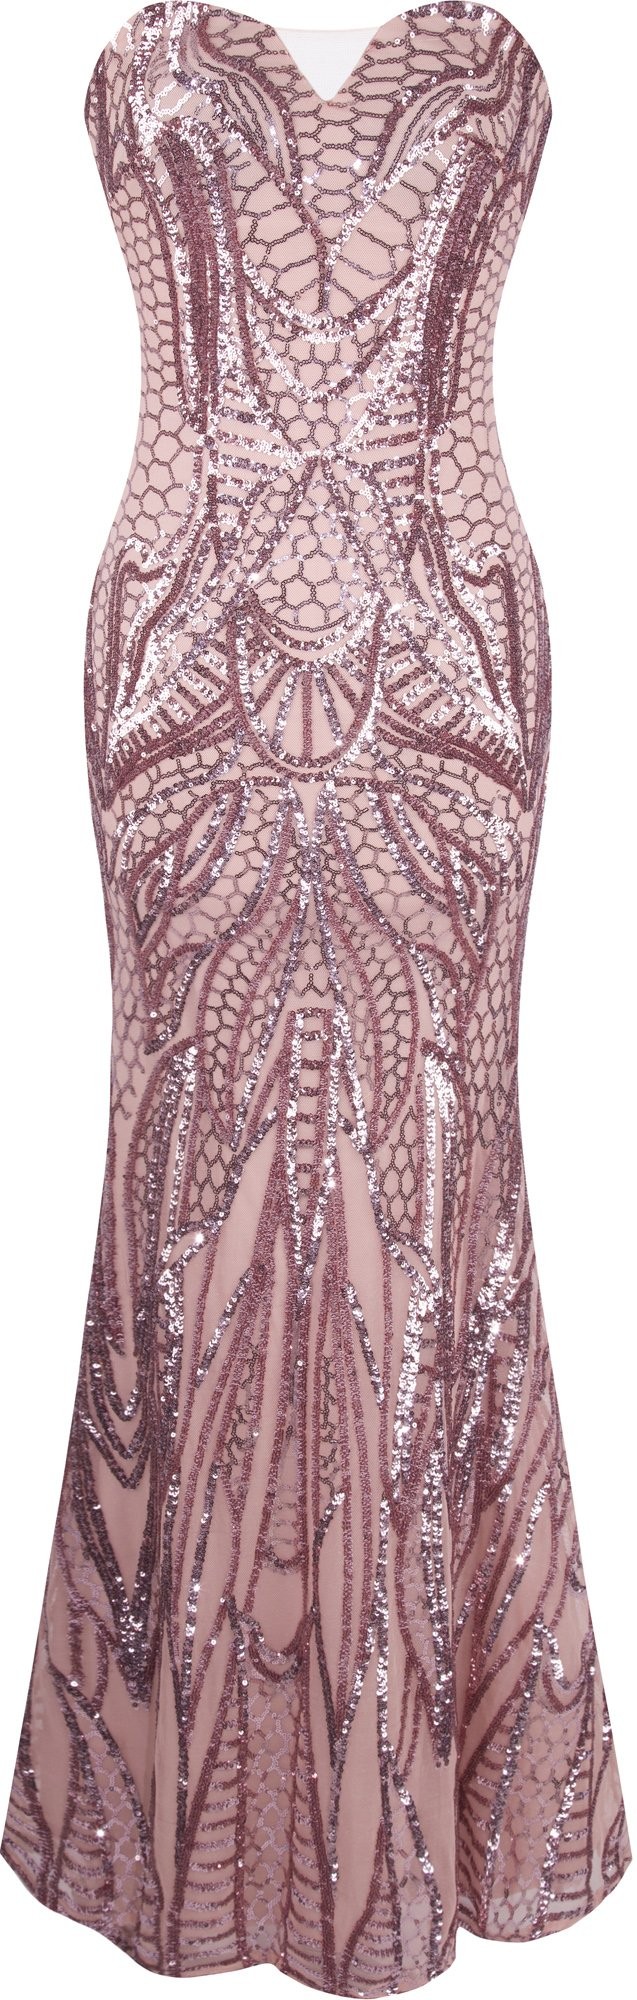 Angel-fashions Women's Notched Strapless Paillette Column Sheath Prom Dress XXLarge